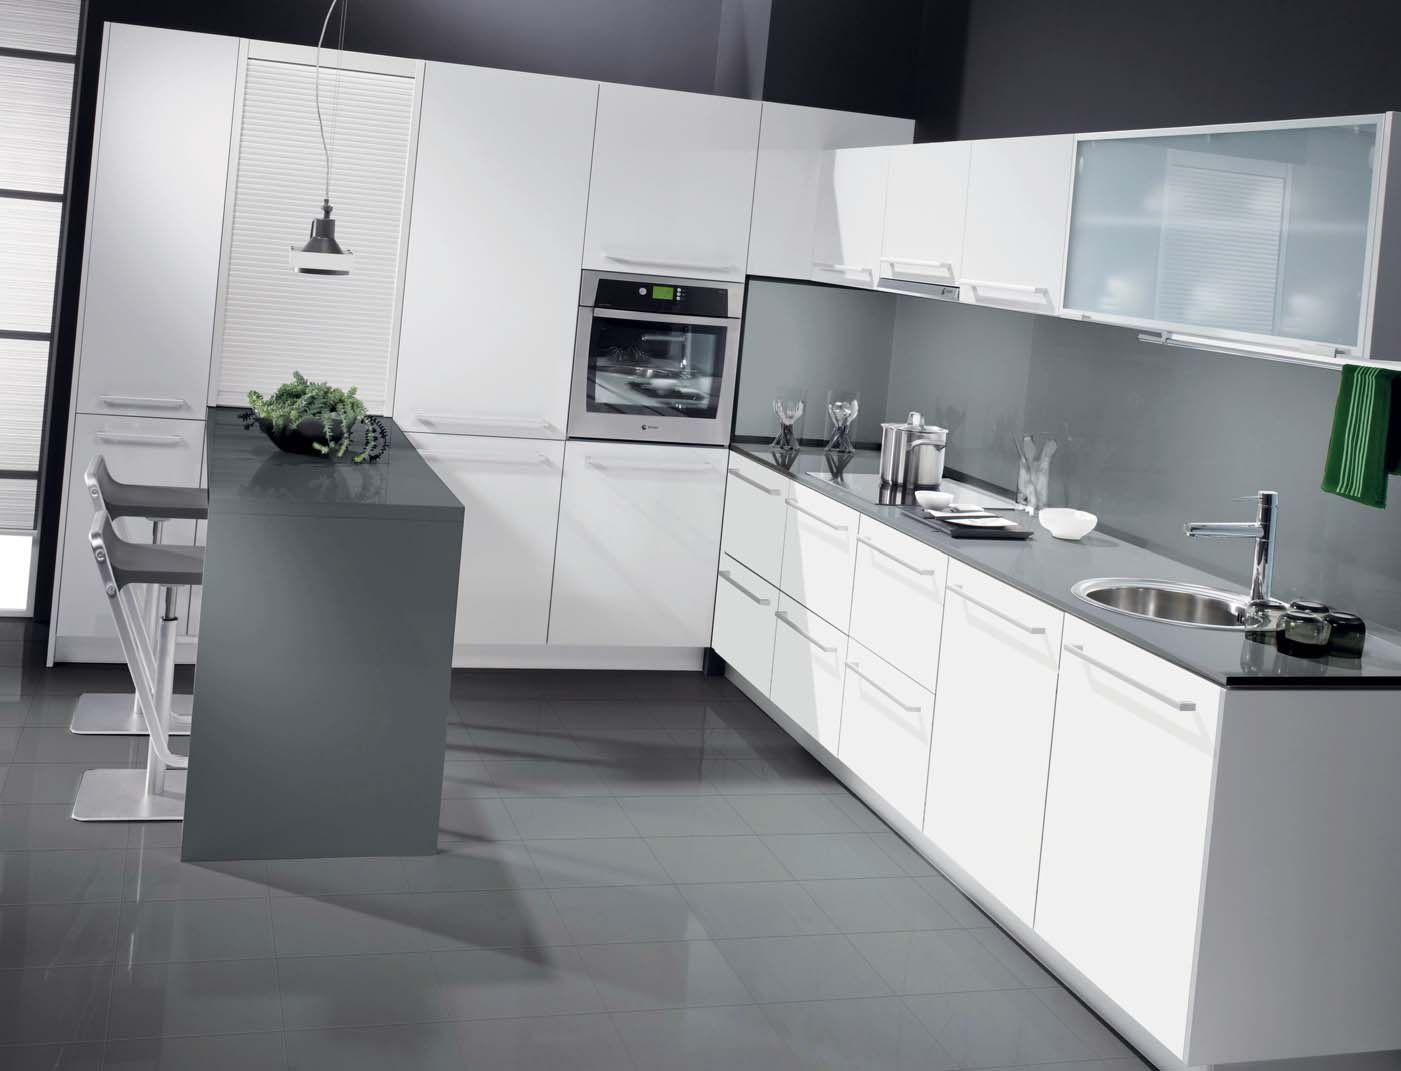 Cocina 88 cocinas capis dise o y fabricaci n de cocinas for Configurador de cocinas